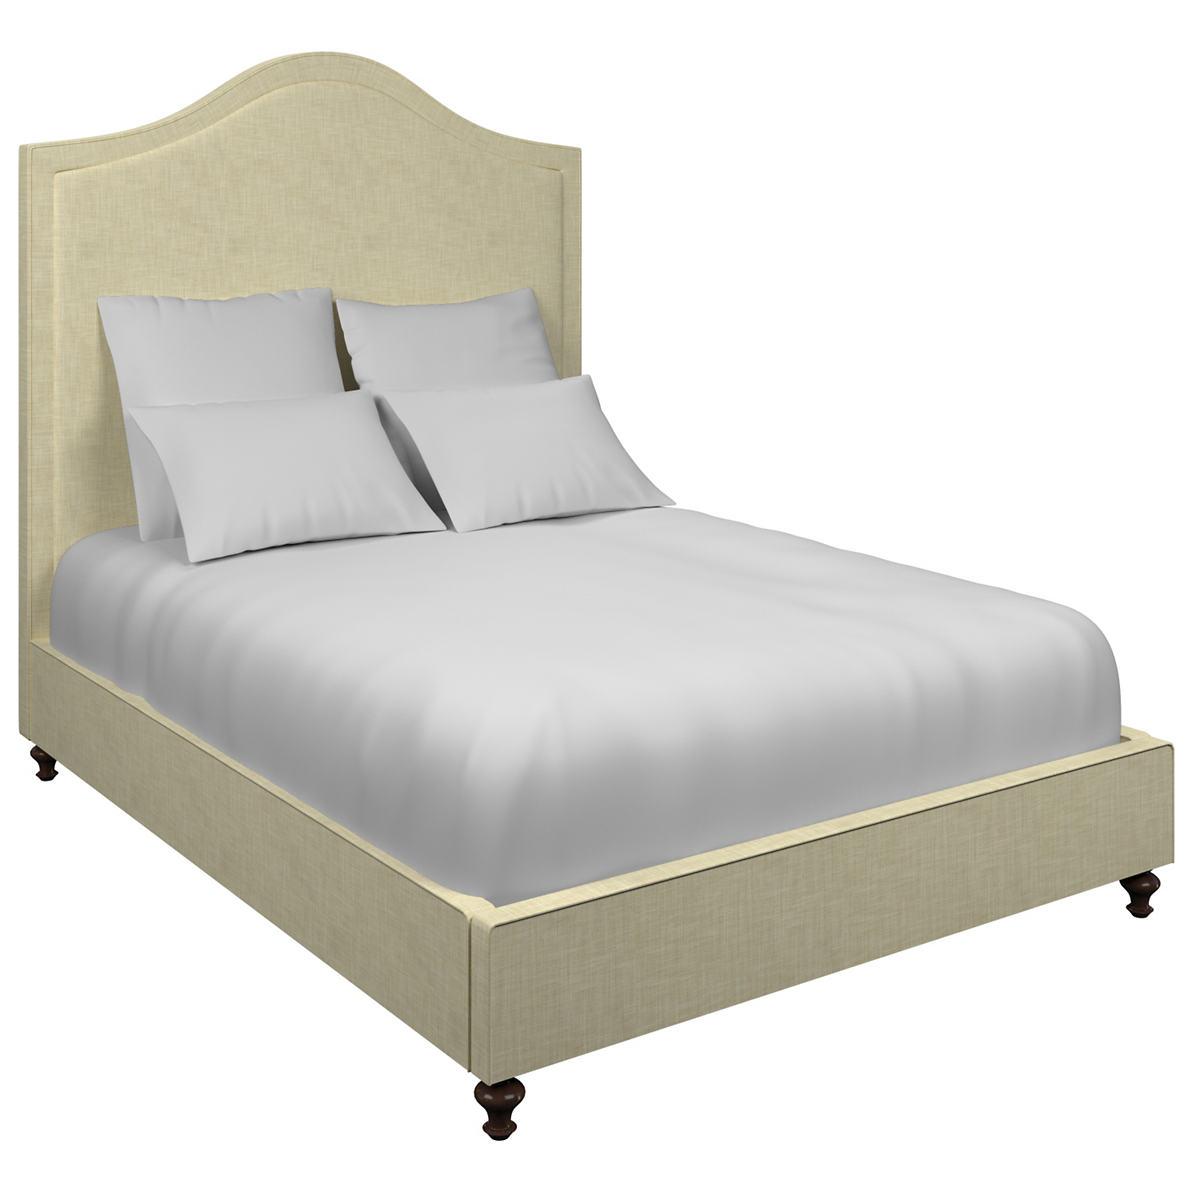 Greylock Ivory Westport Bed